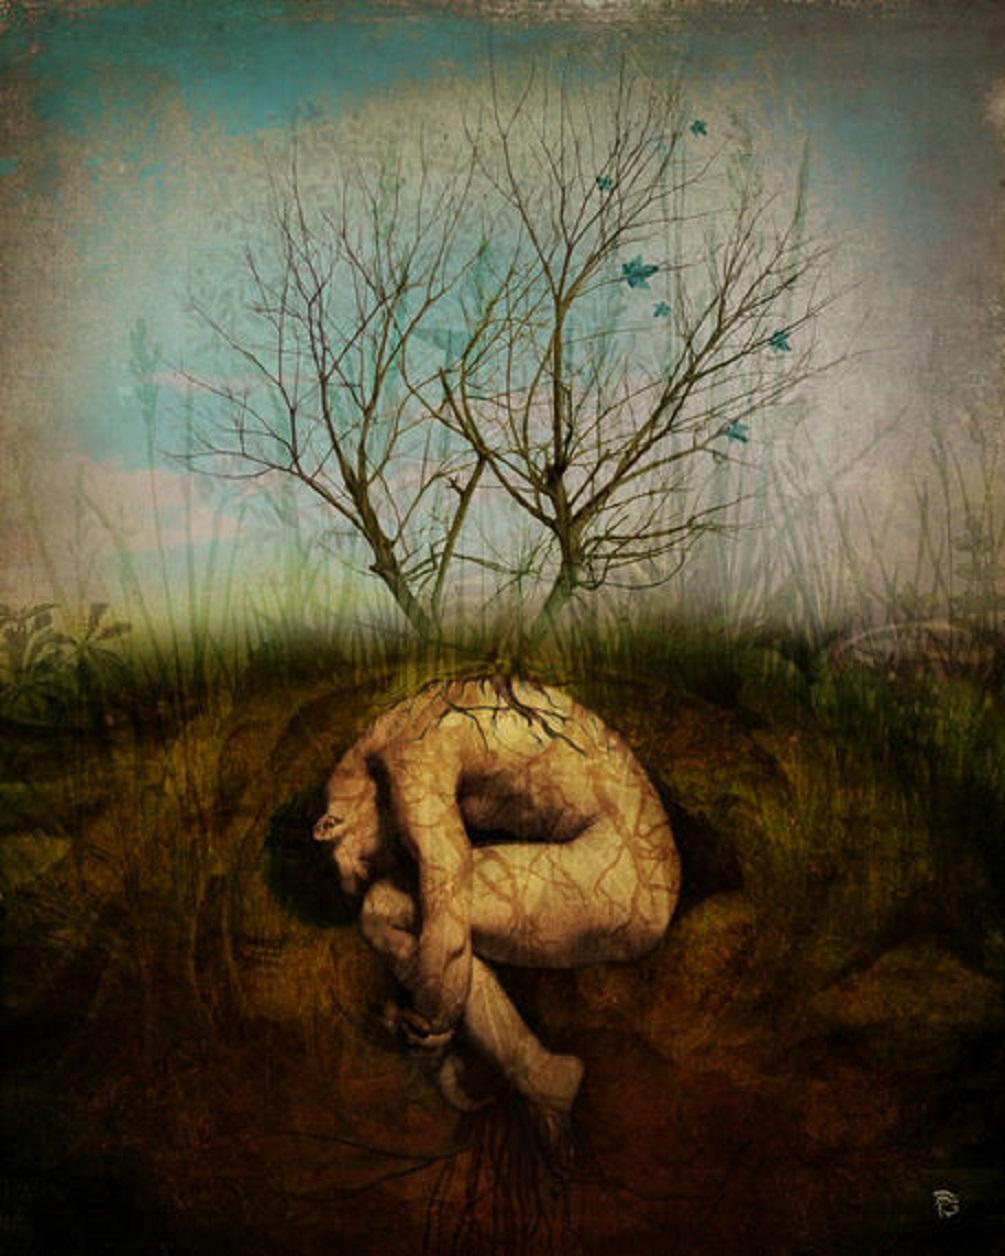 christian-schloe-dreaming-tree